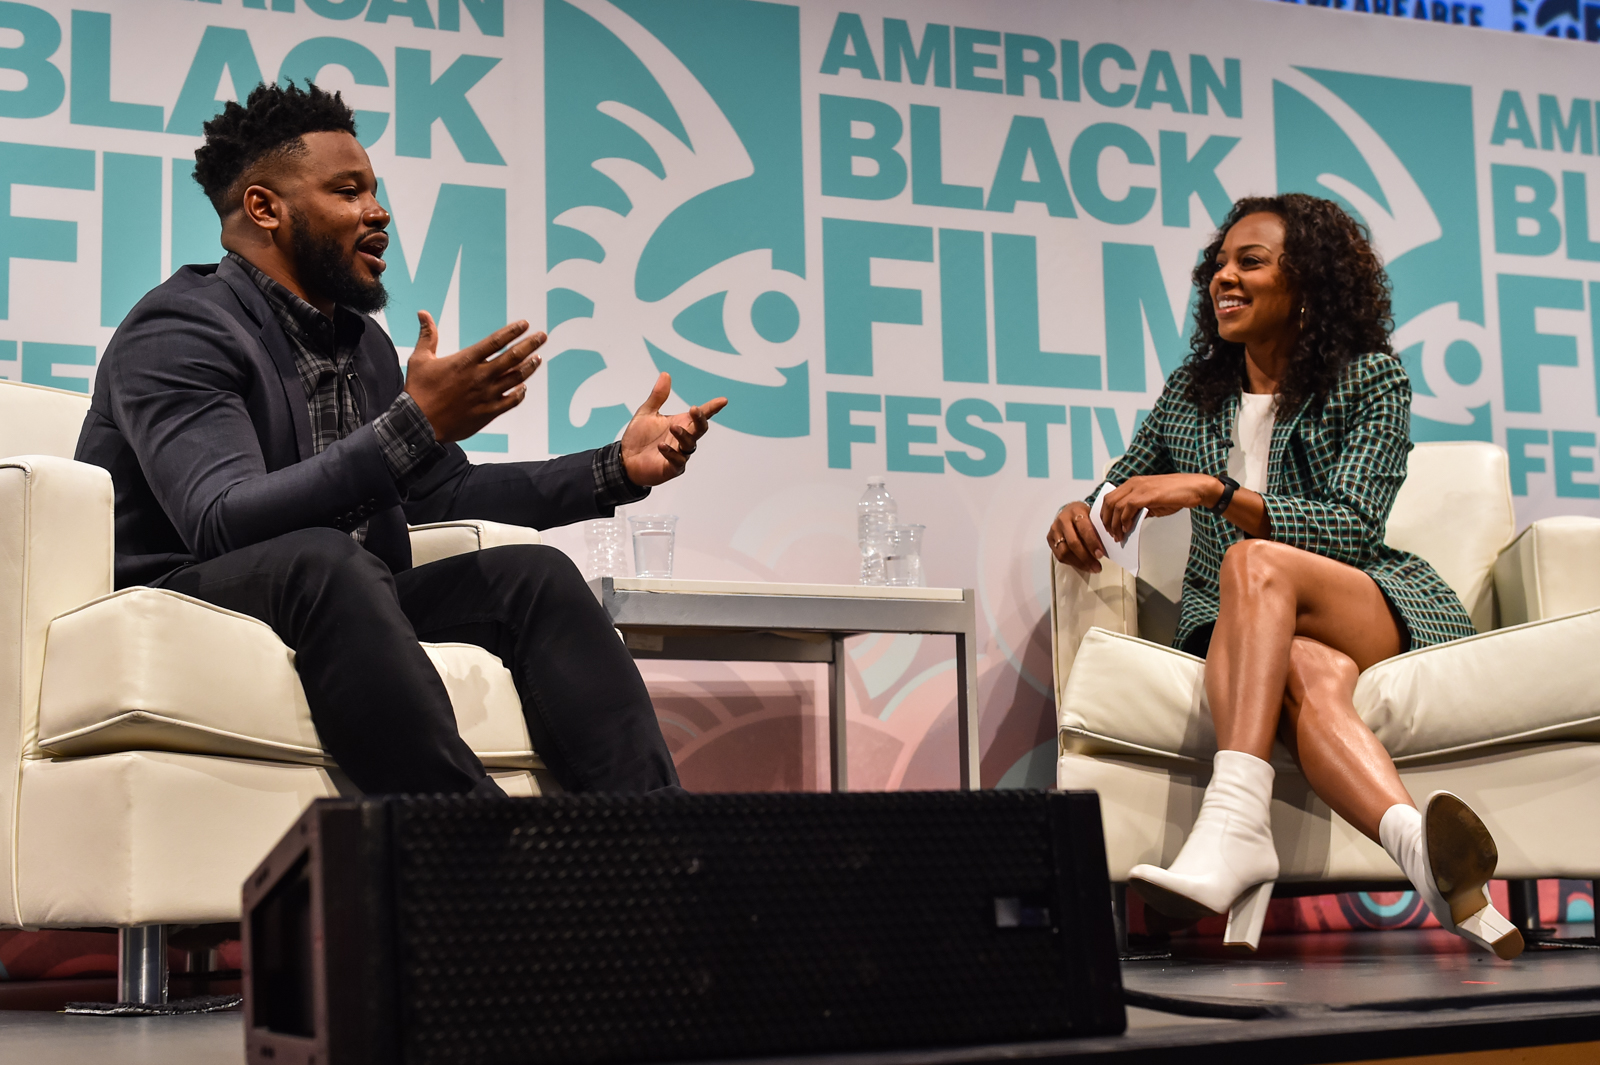 American Black Film Festival 2018 Recap: 'Shoot Your Shot'